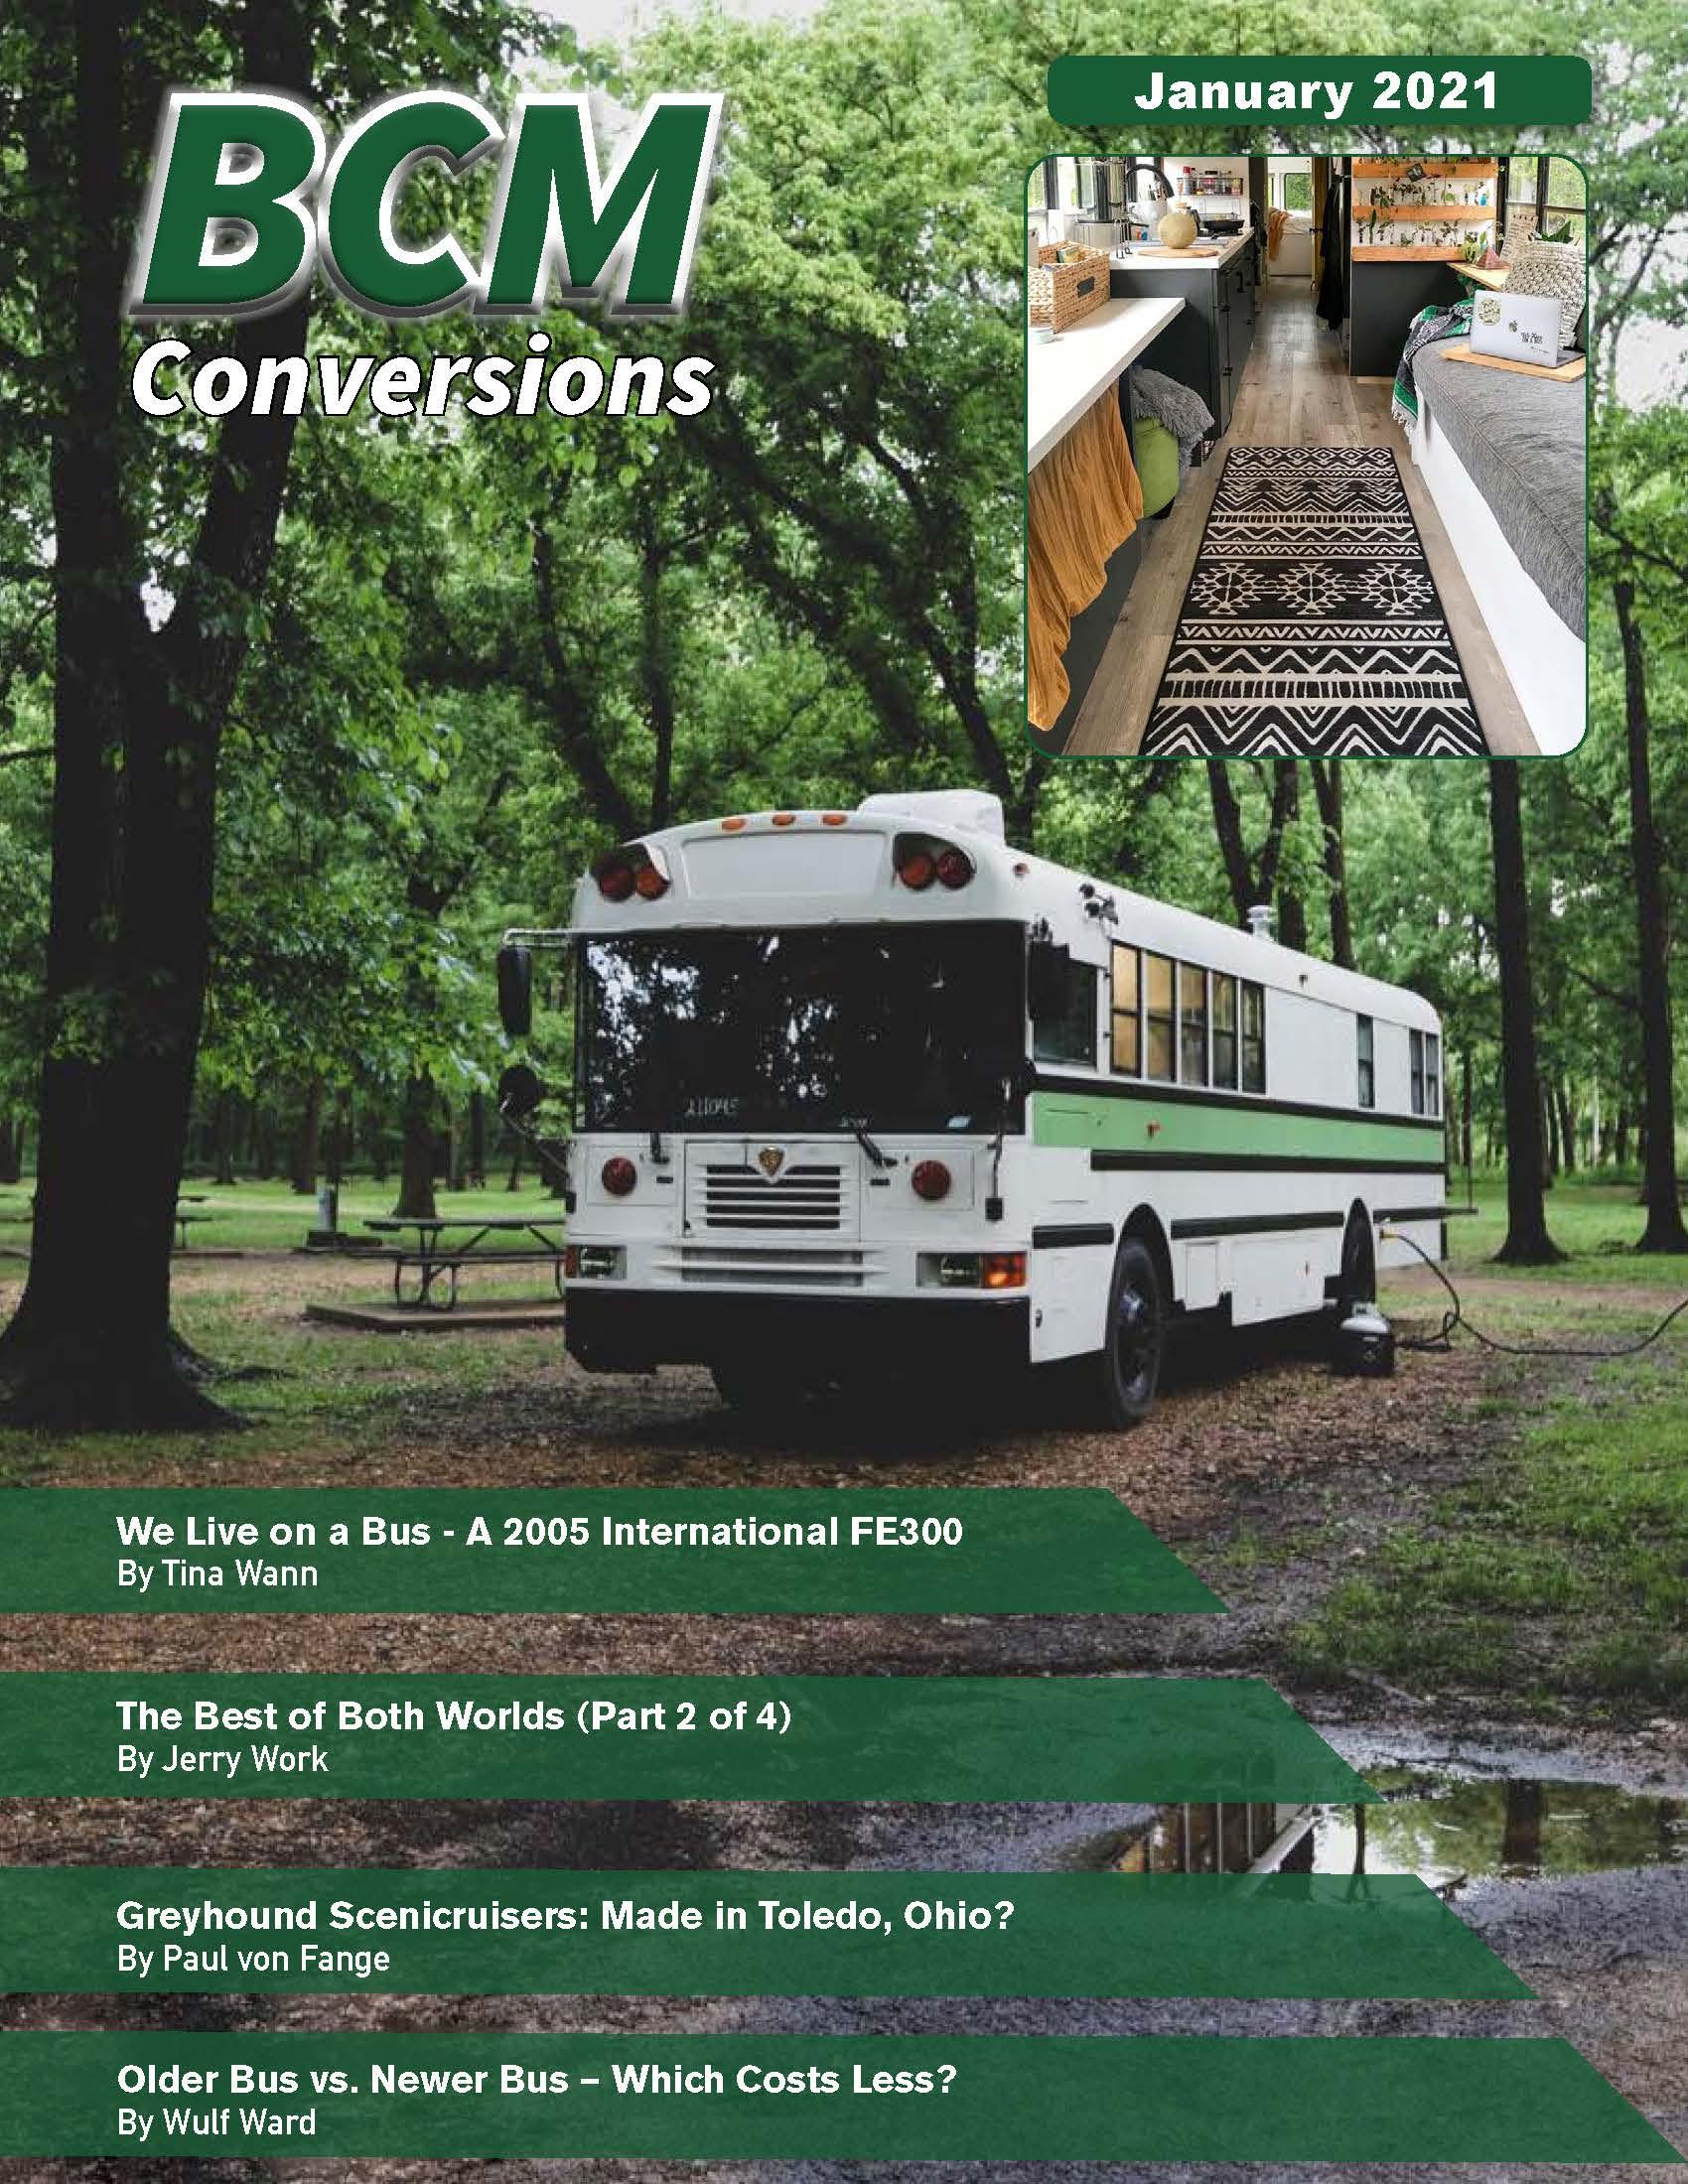 "<a href=""""><img class=""spu-open-10240"" src=""https://www.busconversionmagazine.com/wp-content/uploads/2021/01/January-Issue-2021-TOC.jpg""/></a>"